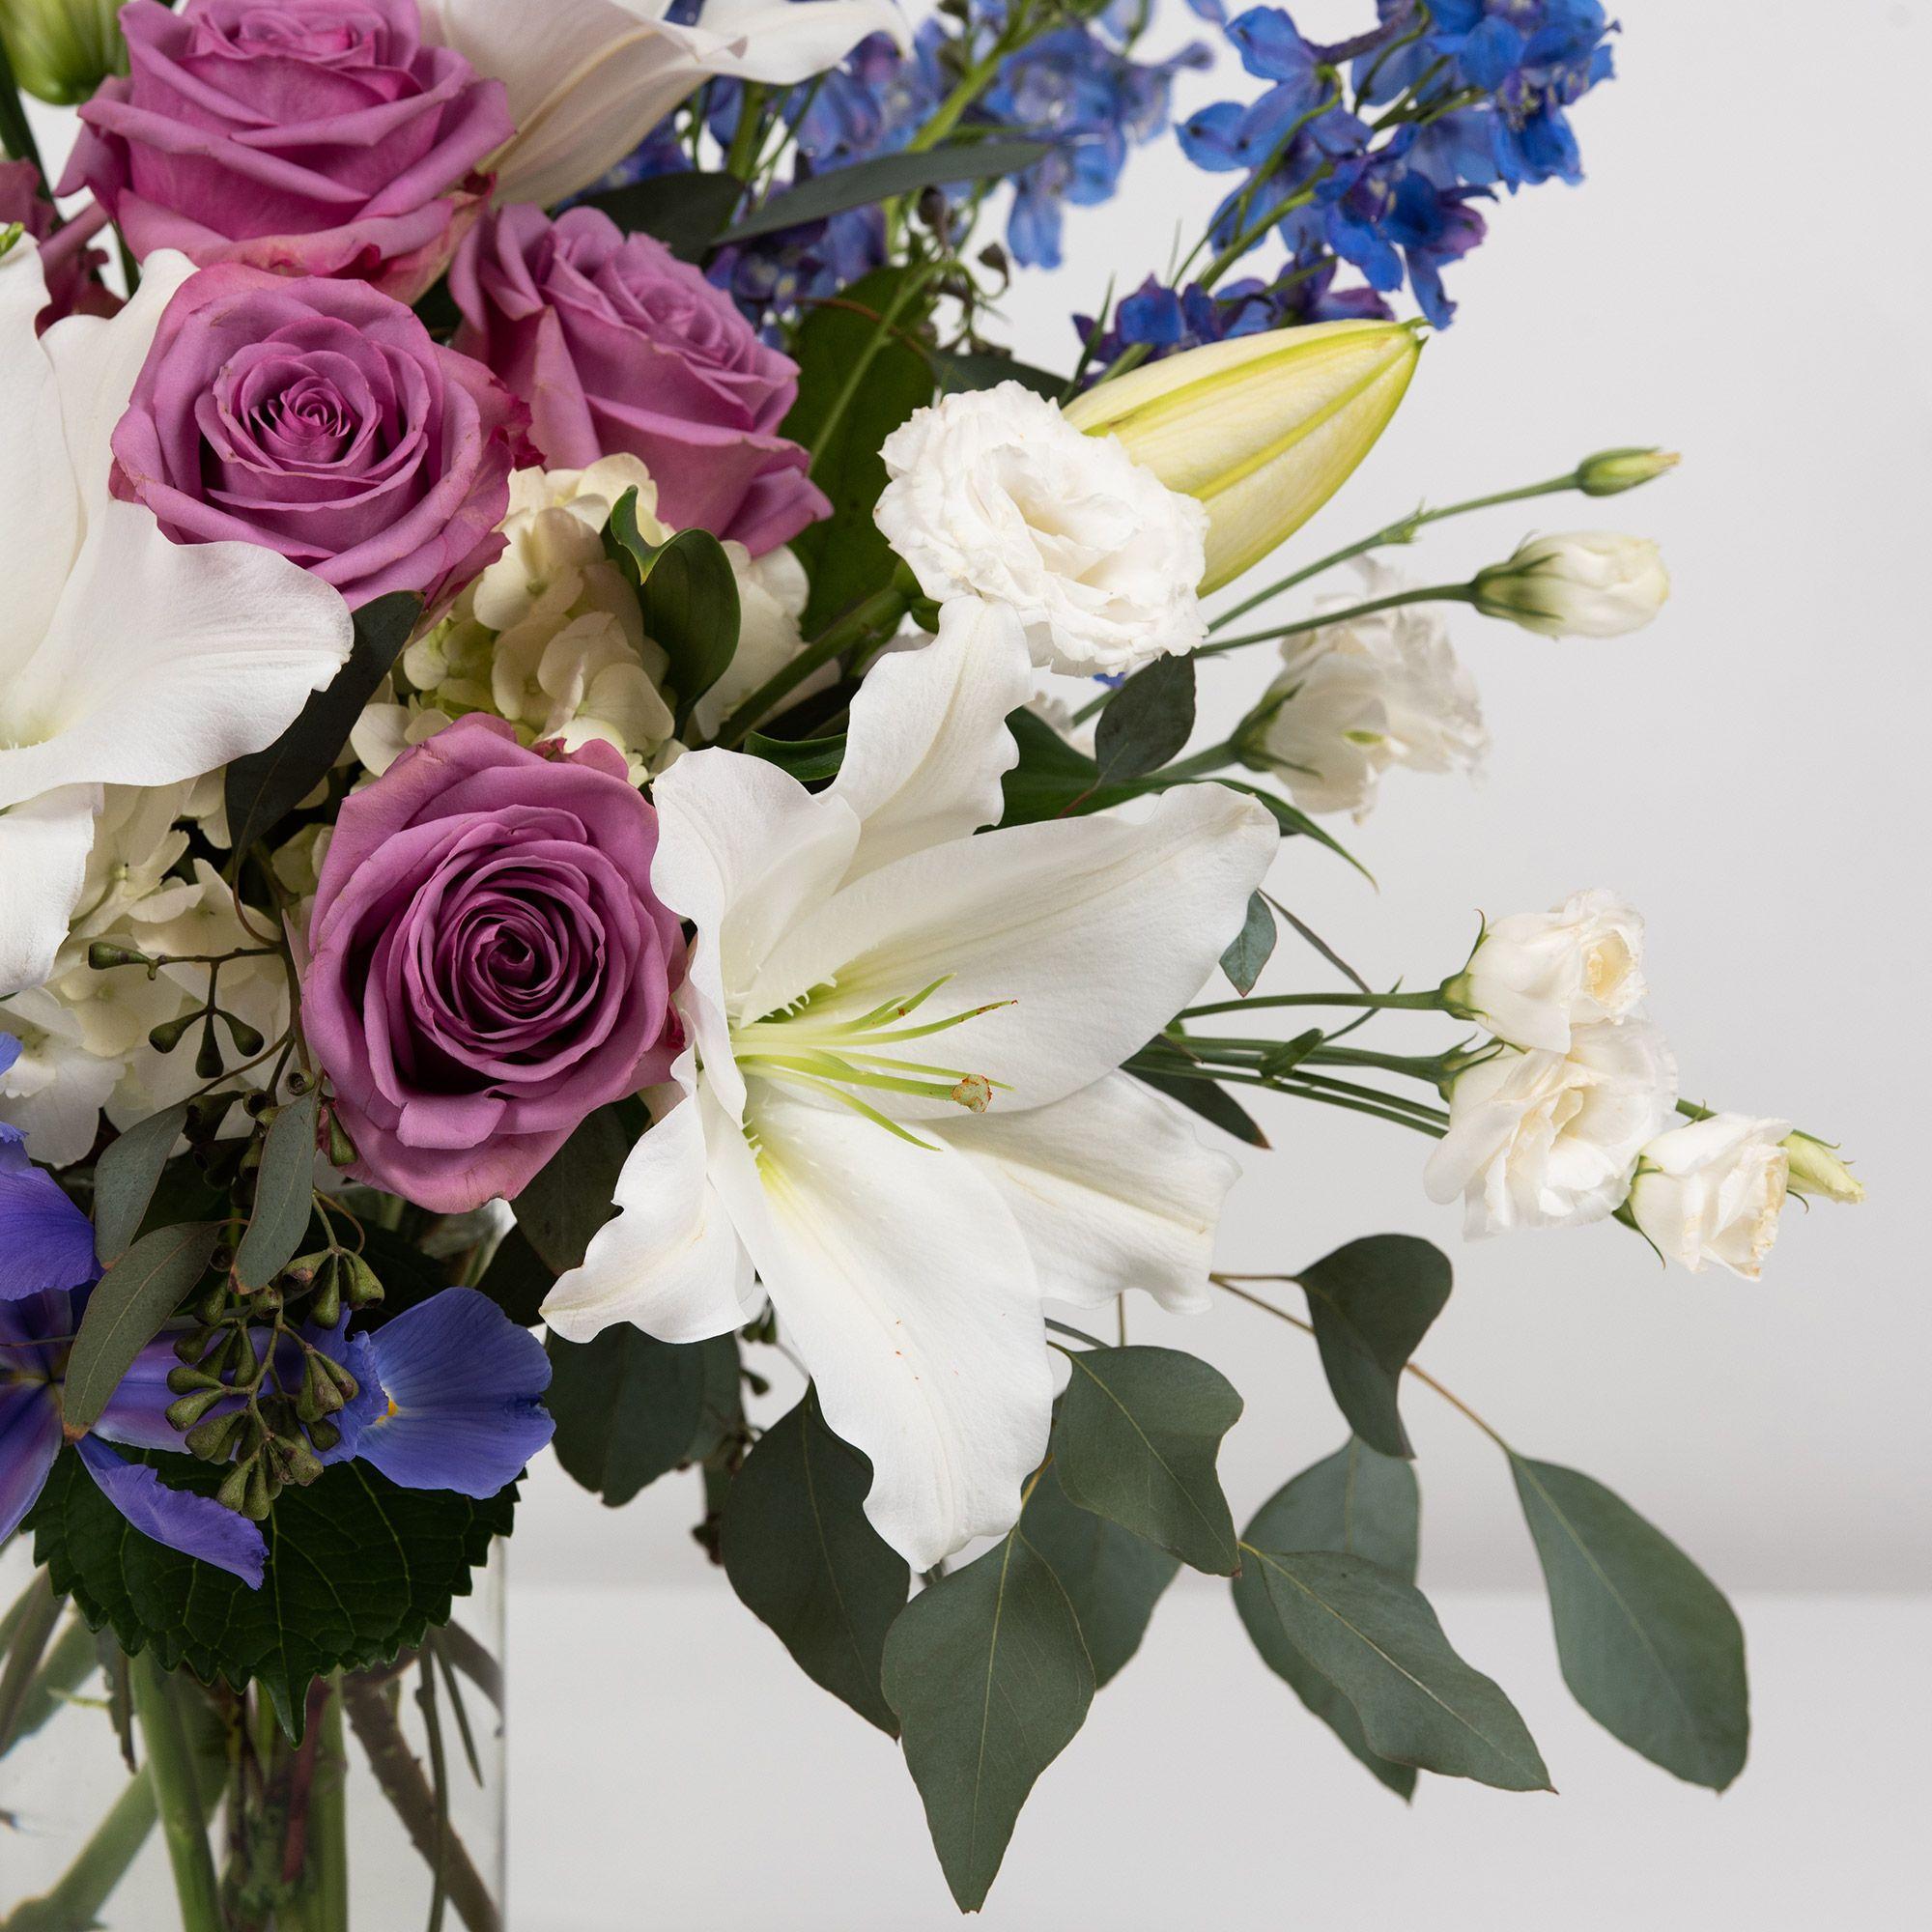 Serenity Seattle Florist: Flower Lab | Local Flower ...